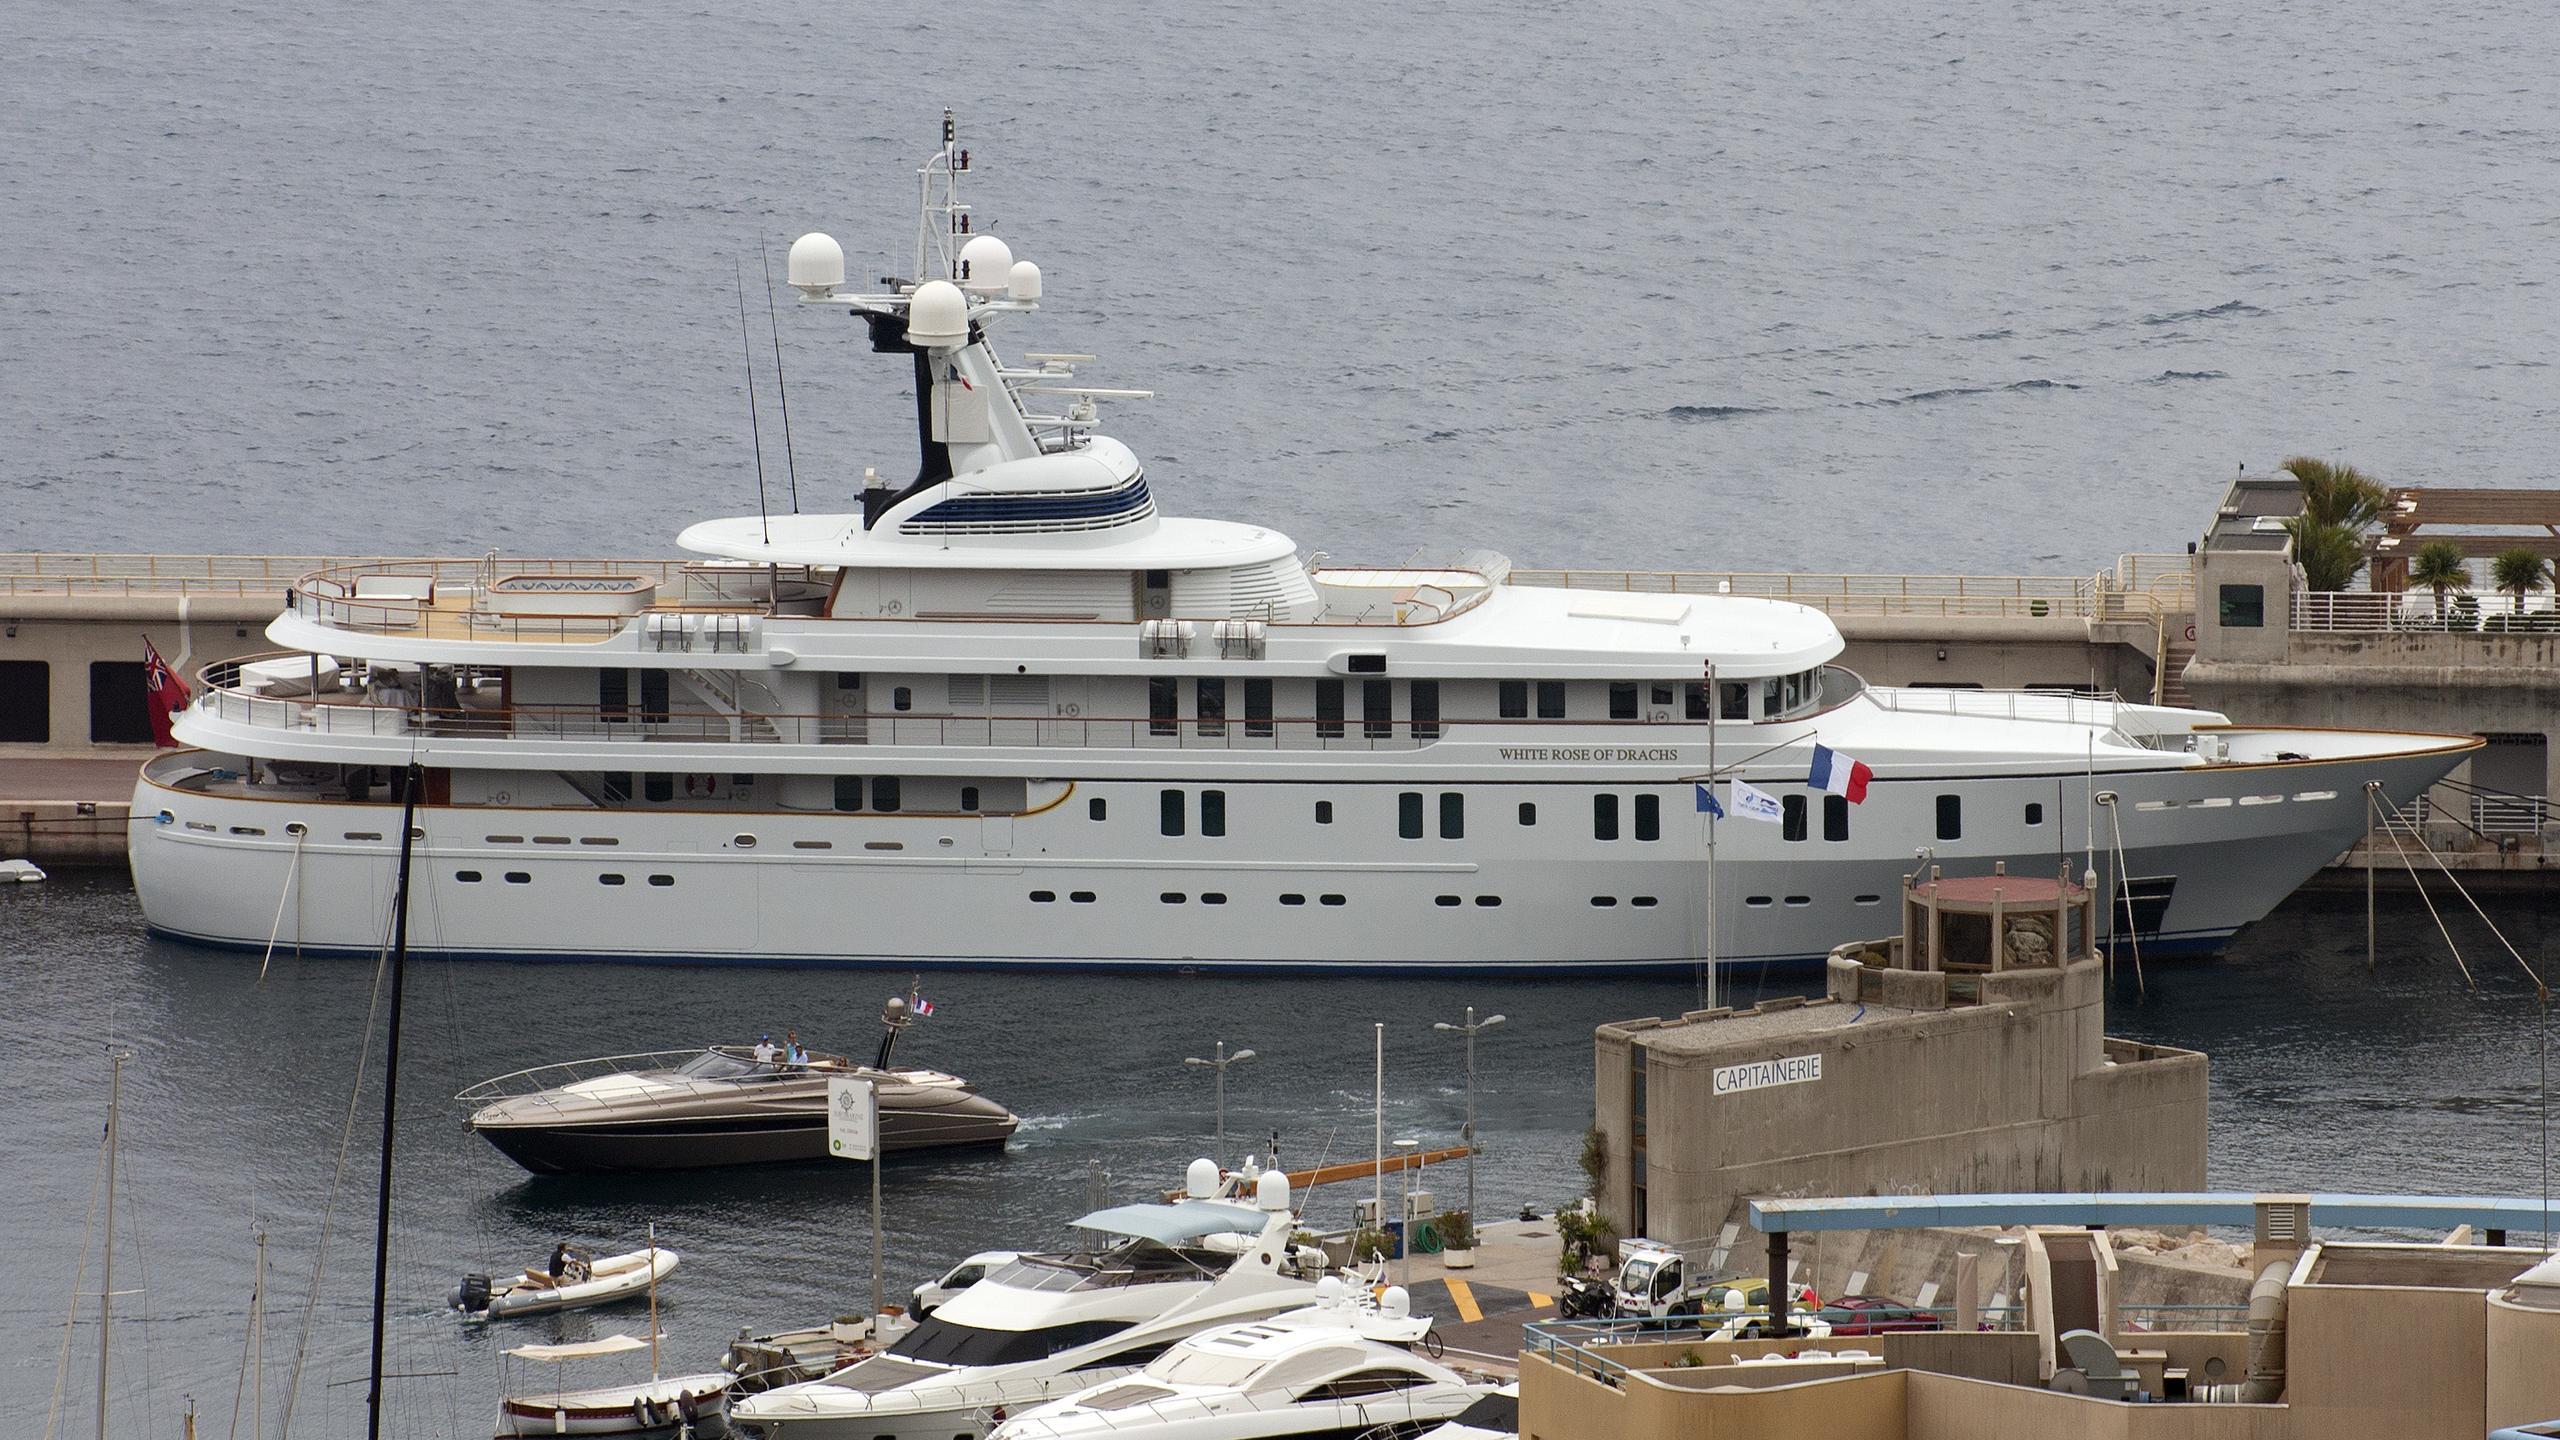 white-rose-of-drachs-motor-yacht-peterswerft-kusch-2004-65m-profile